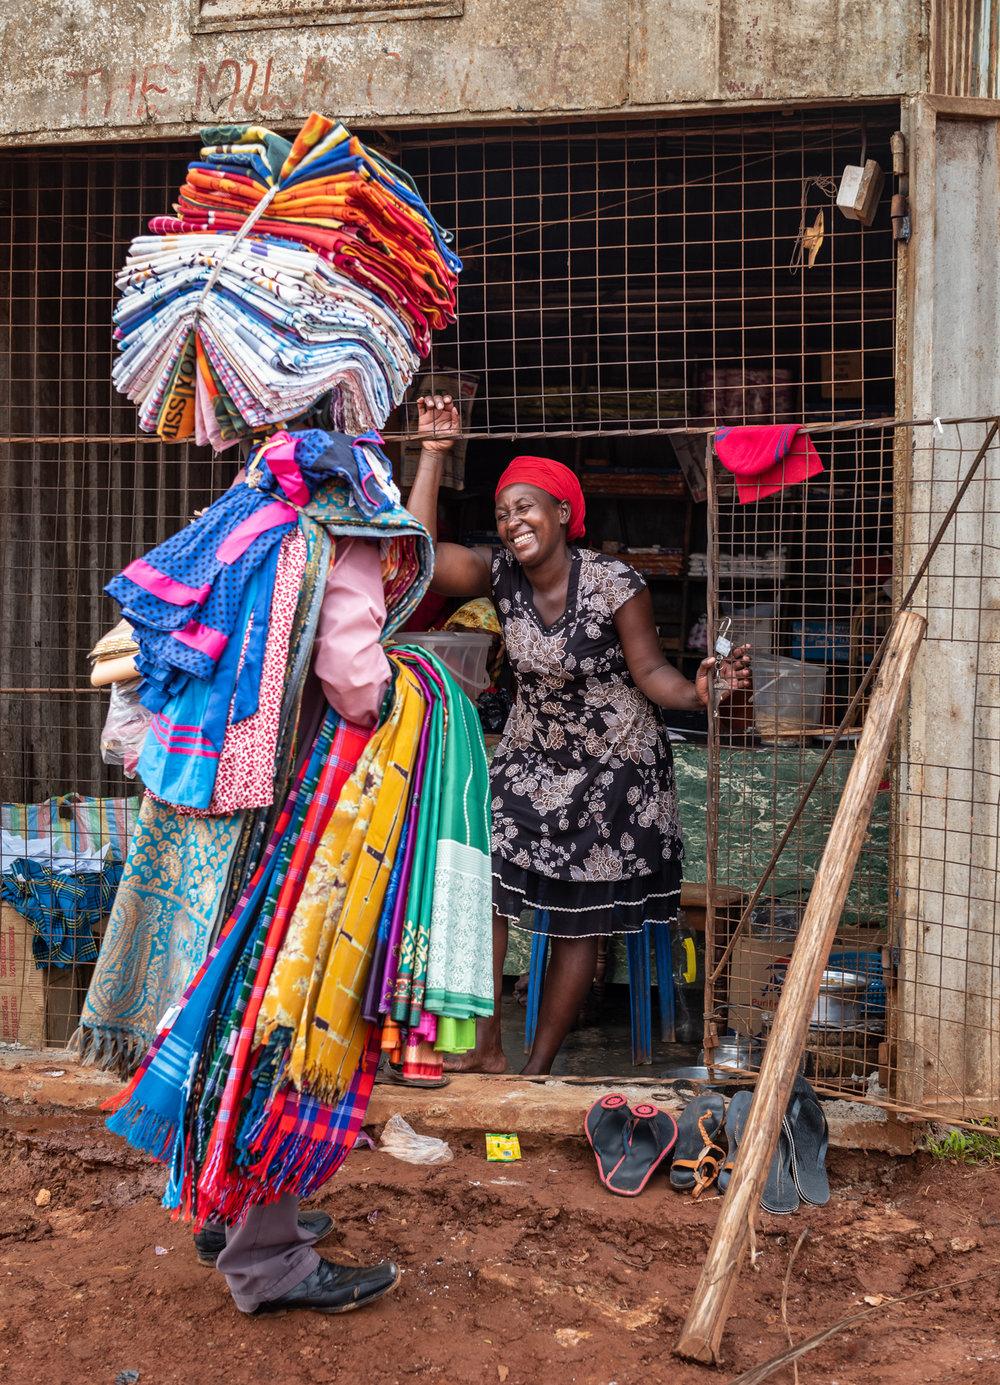 A salesman peddling textiles in Kyebando, Uganda